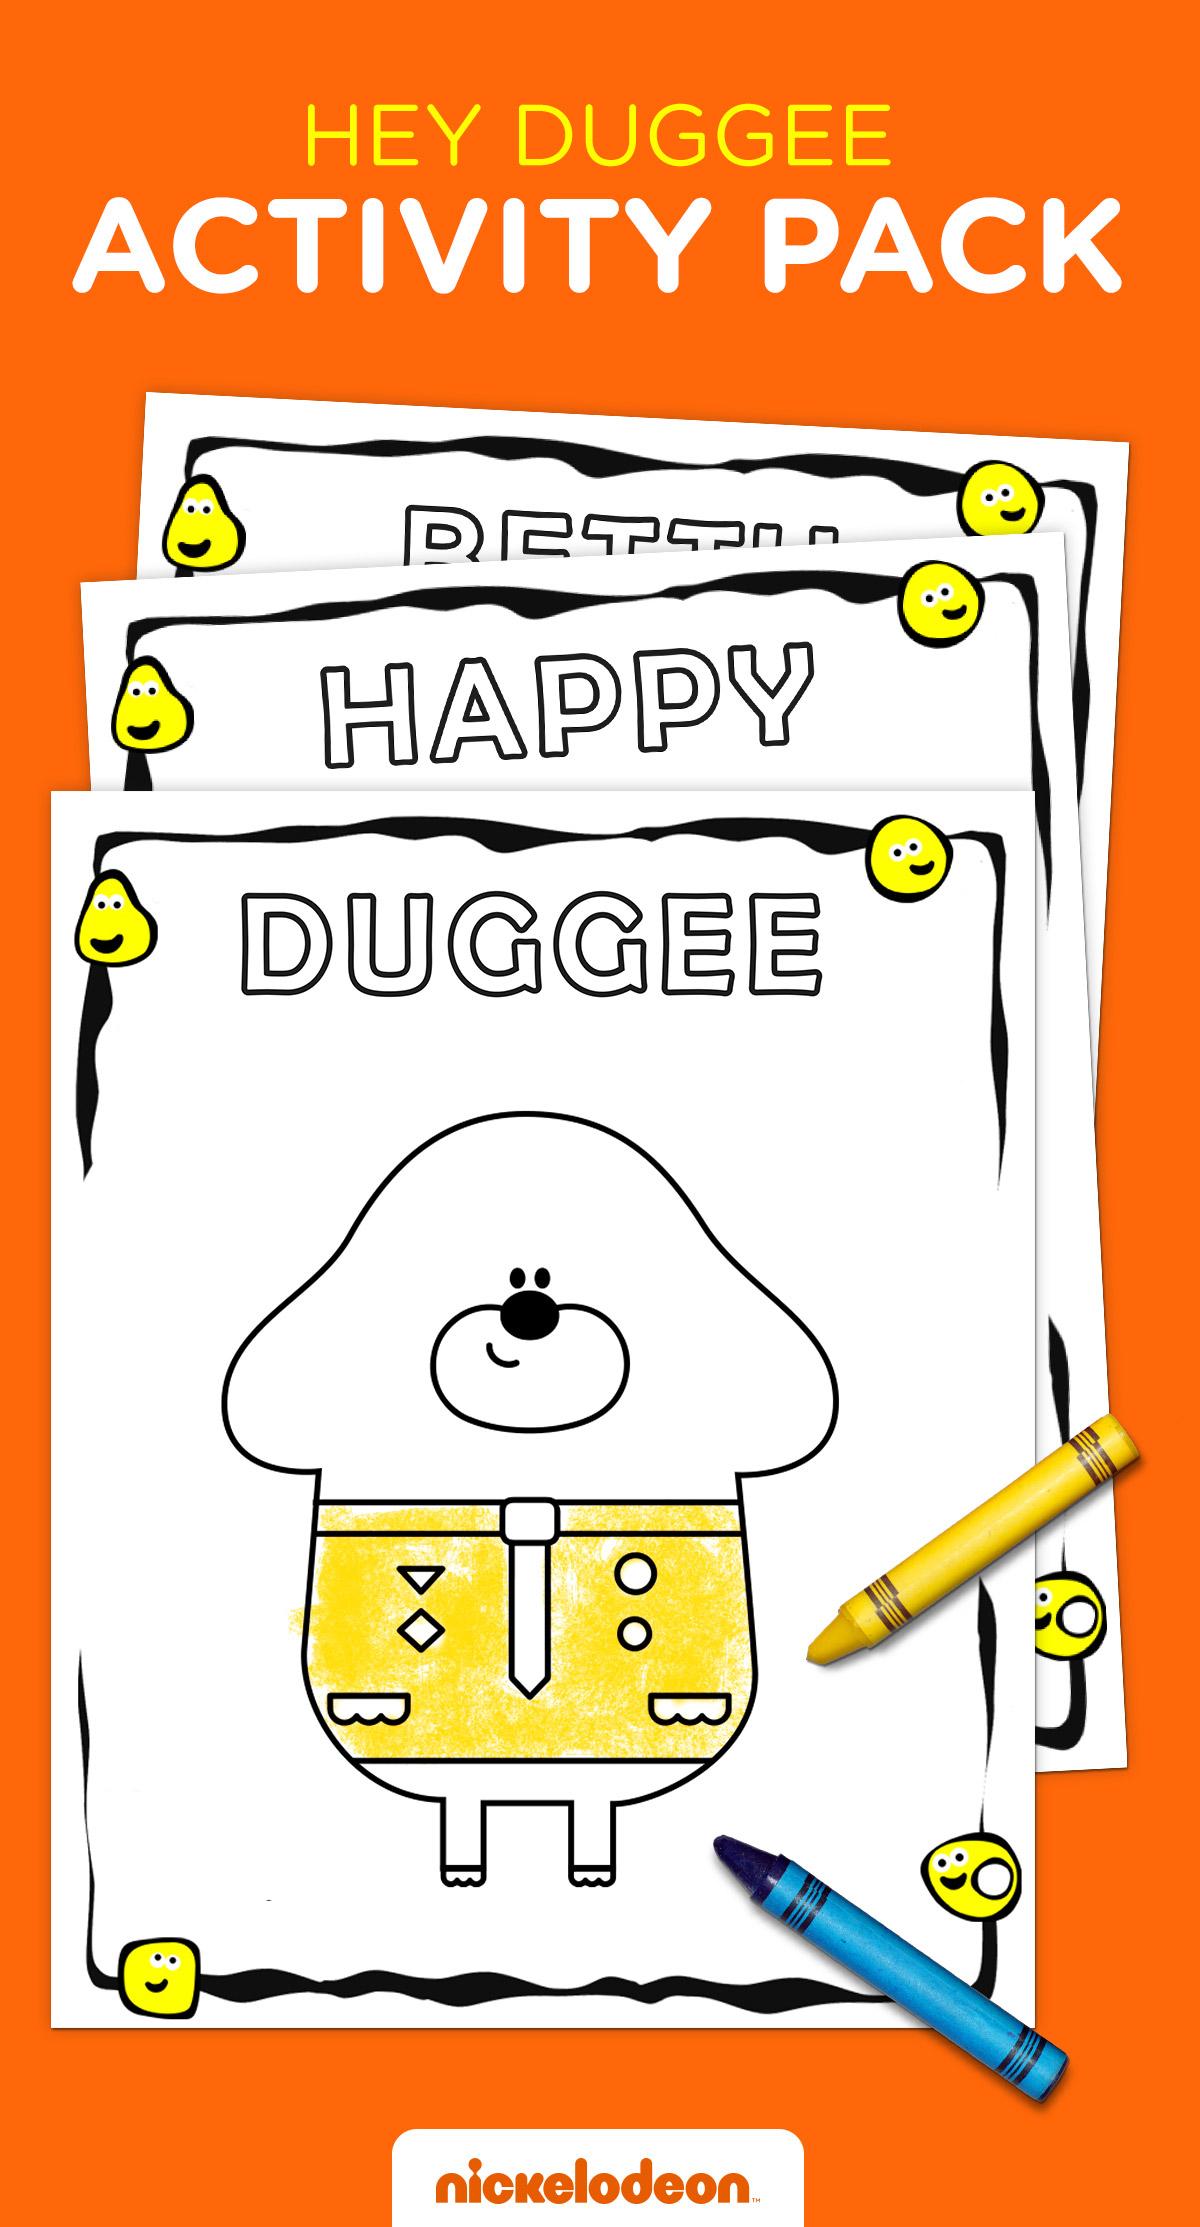 Hey Duggee Activity Pack